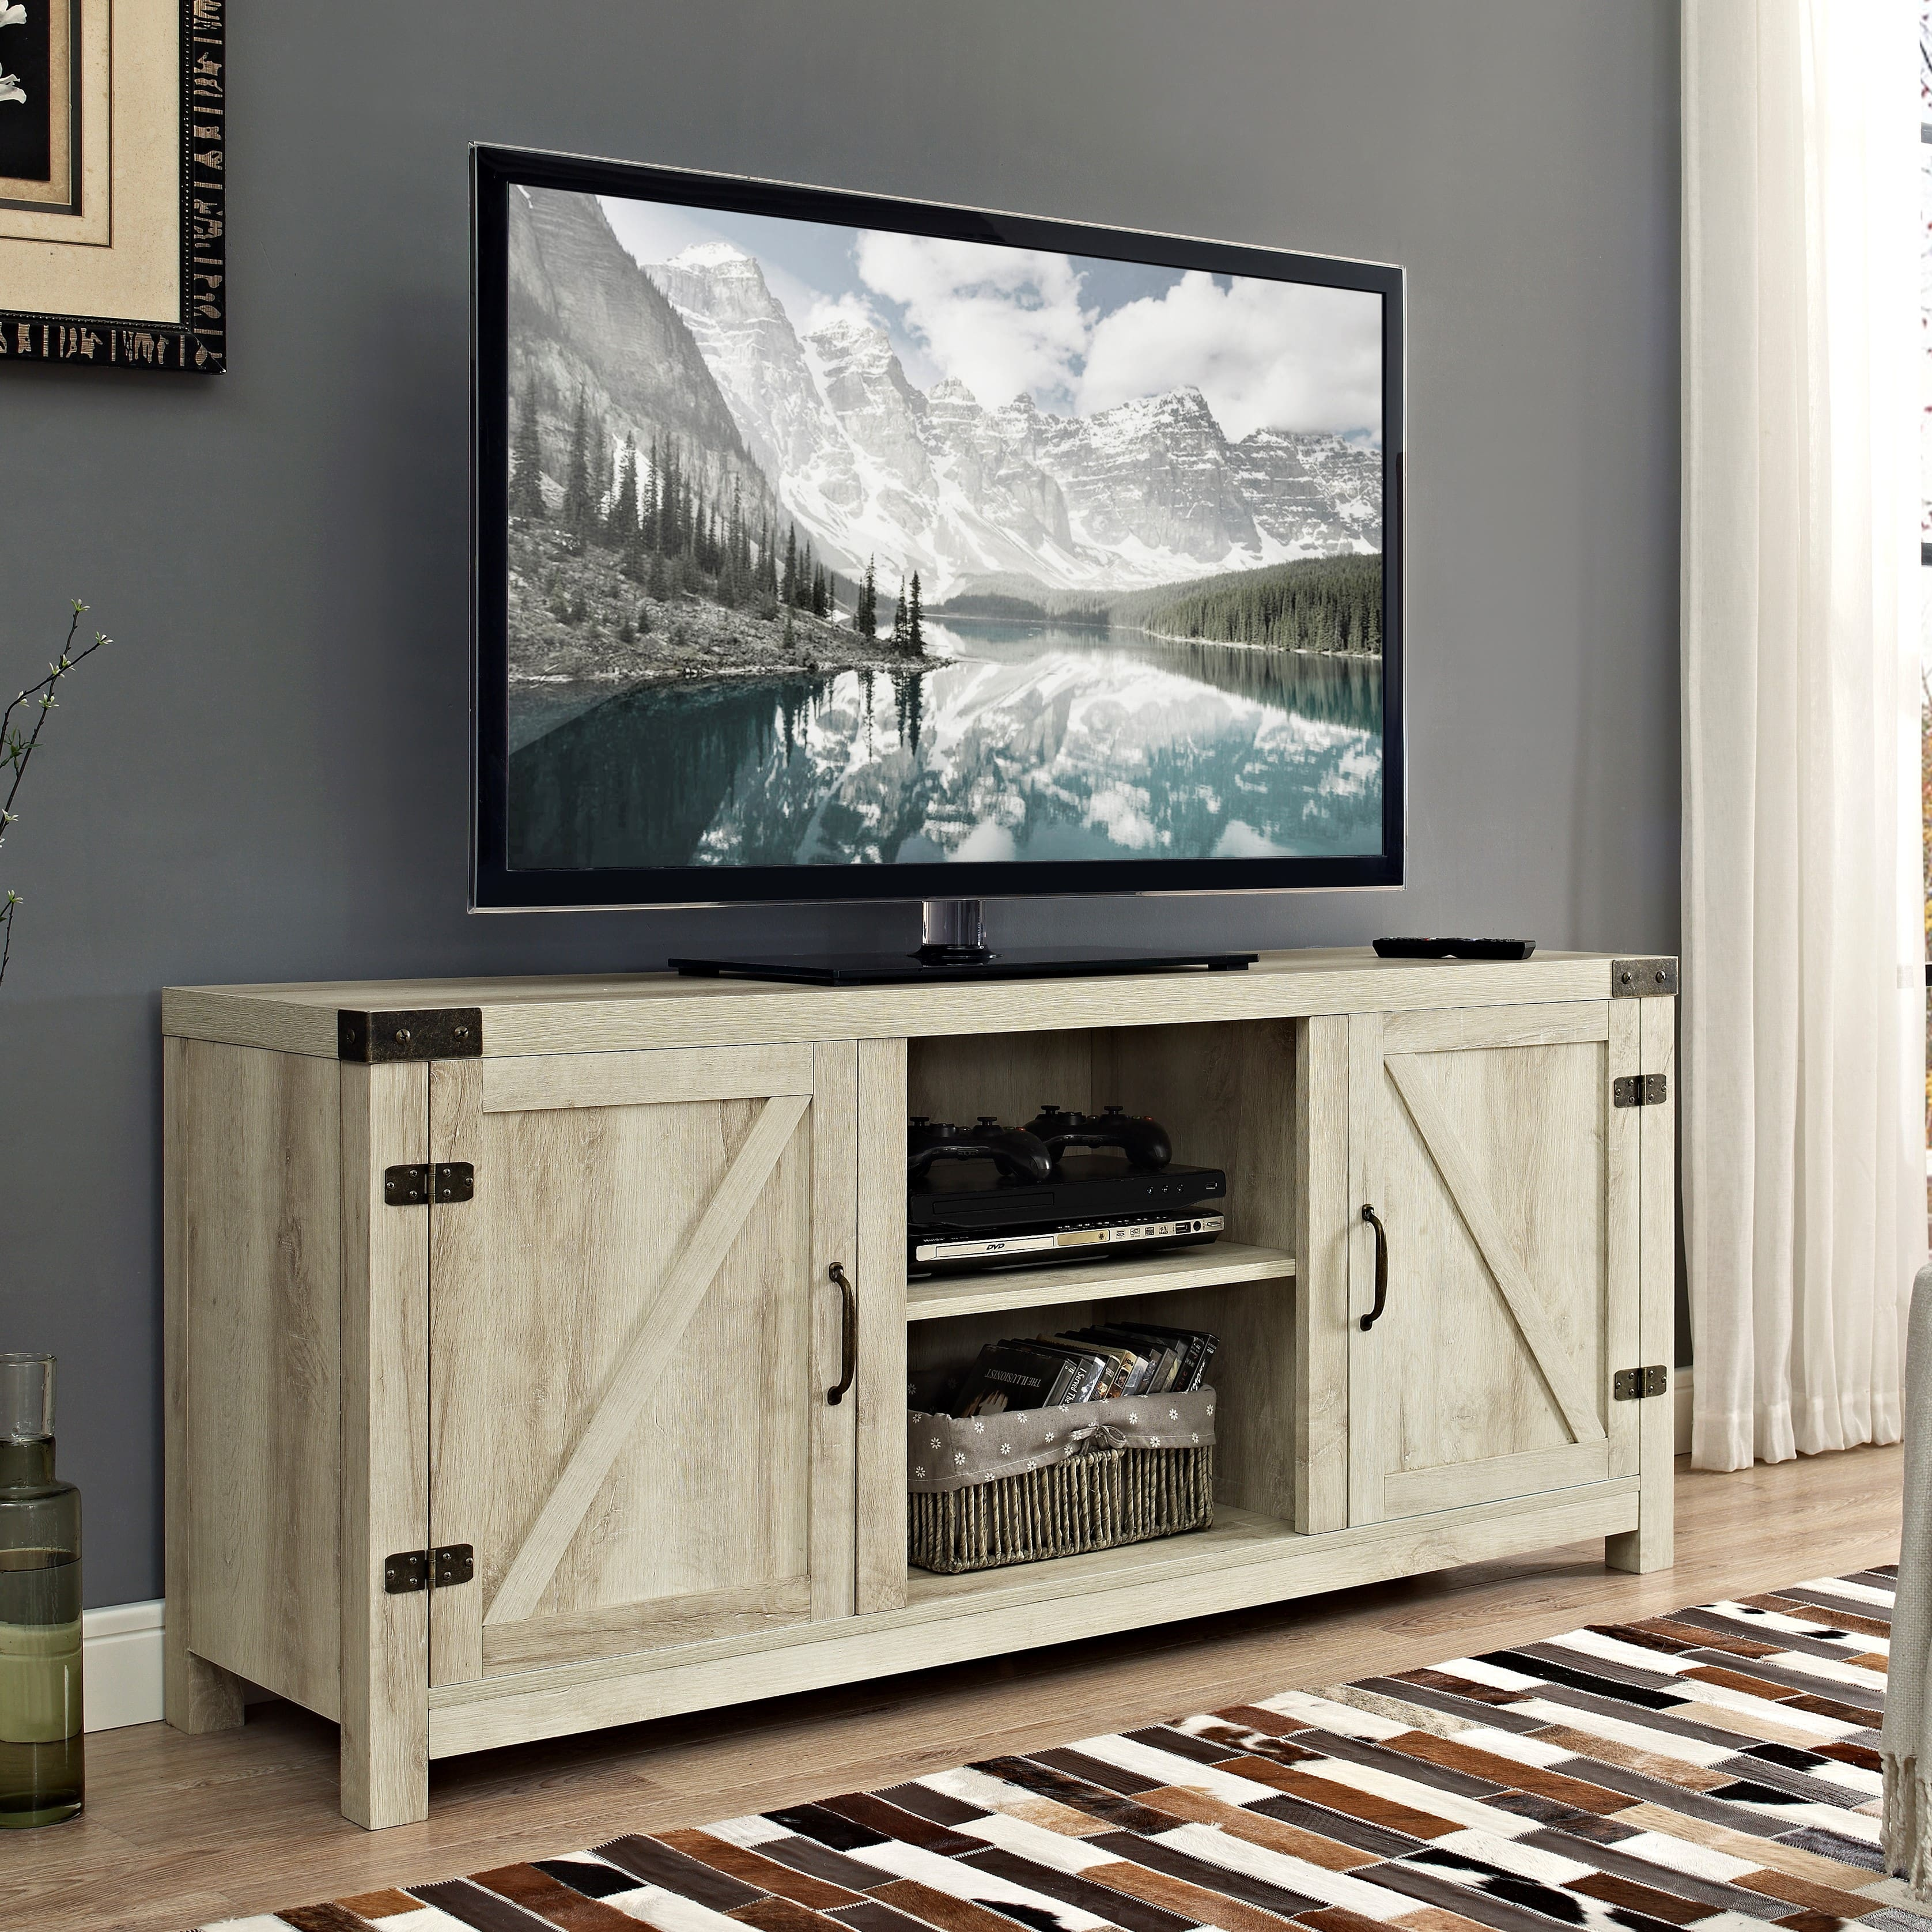 "Woven Paths Modern Farmhouse Barn Door TV Stand for TVs up to 65"", White Oak - Walmart.com - Walmart.com $153.00"